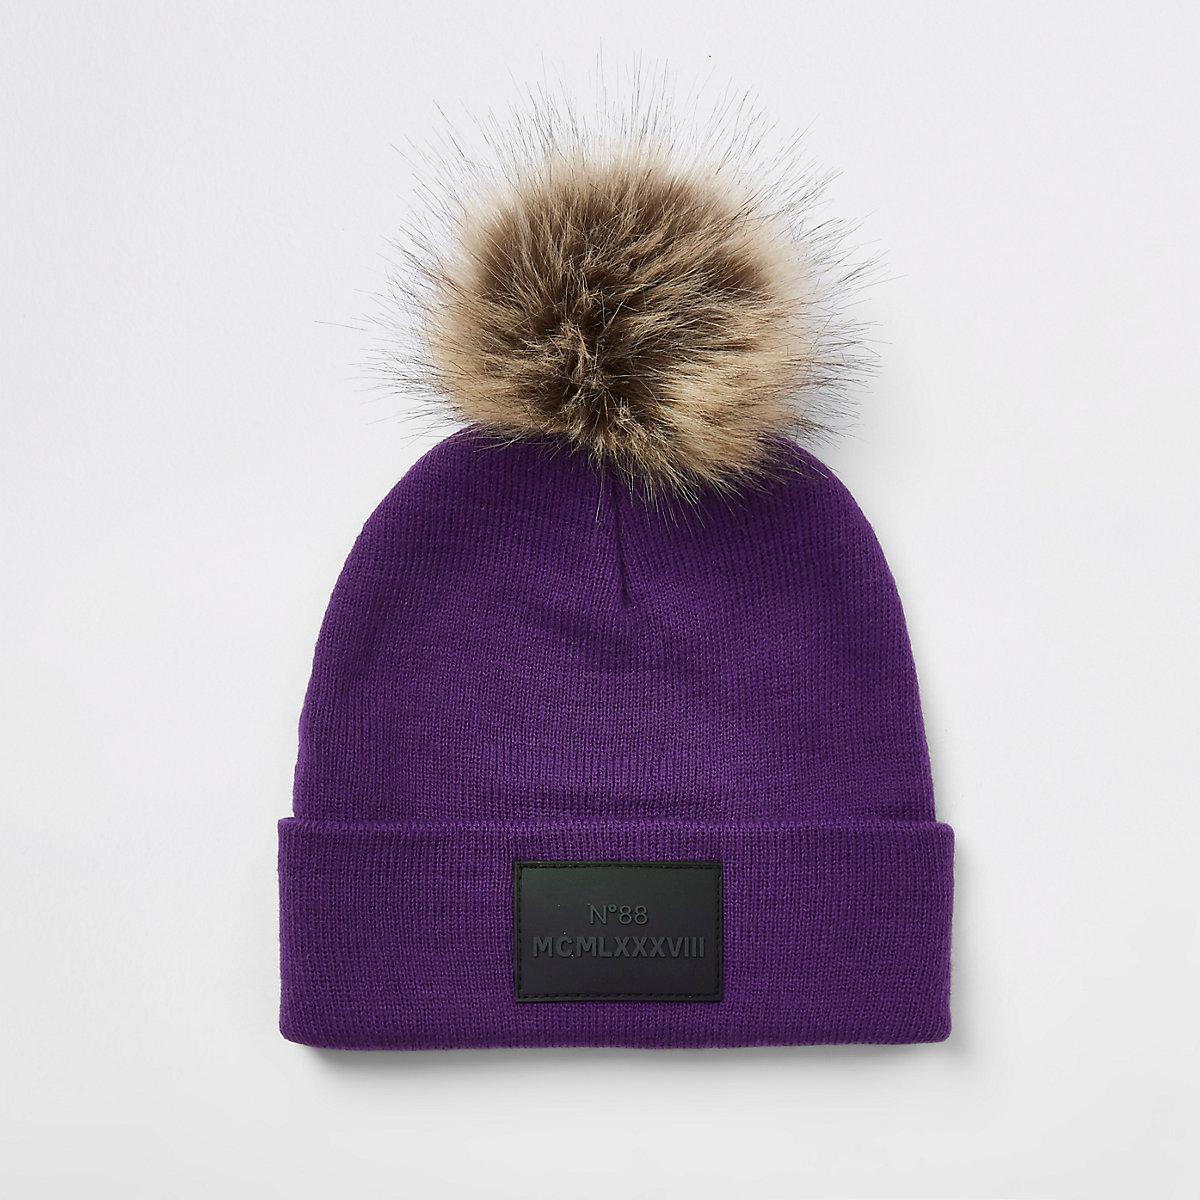 Boys purple faux fur pom pom beanie hat - Hats - Accessories - boys 23054ebe6ea